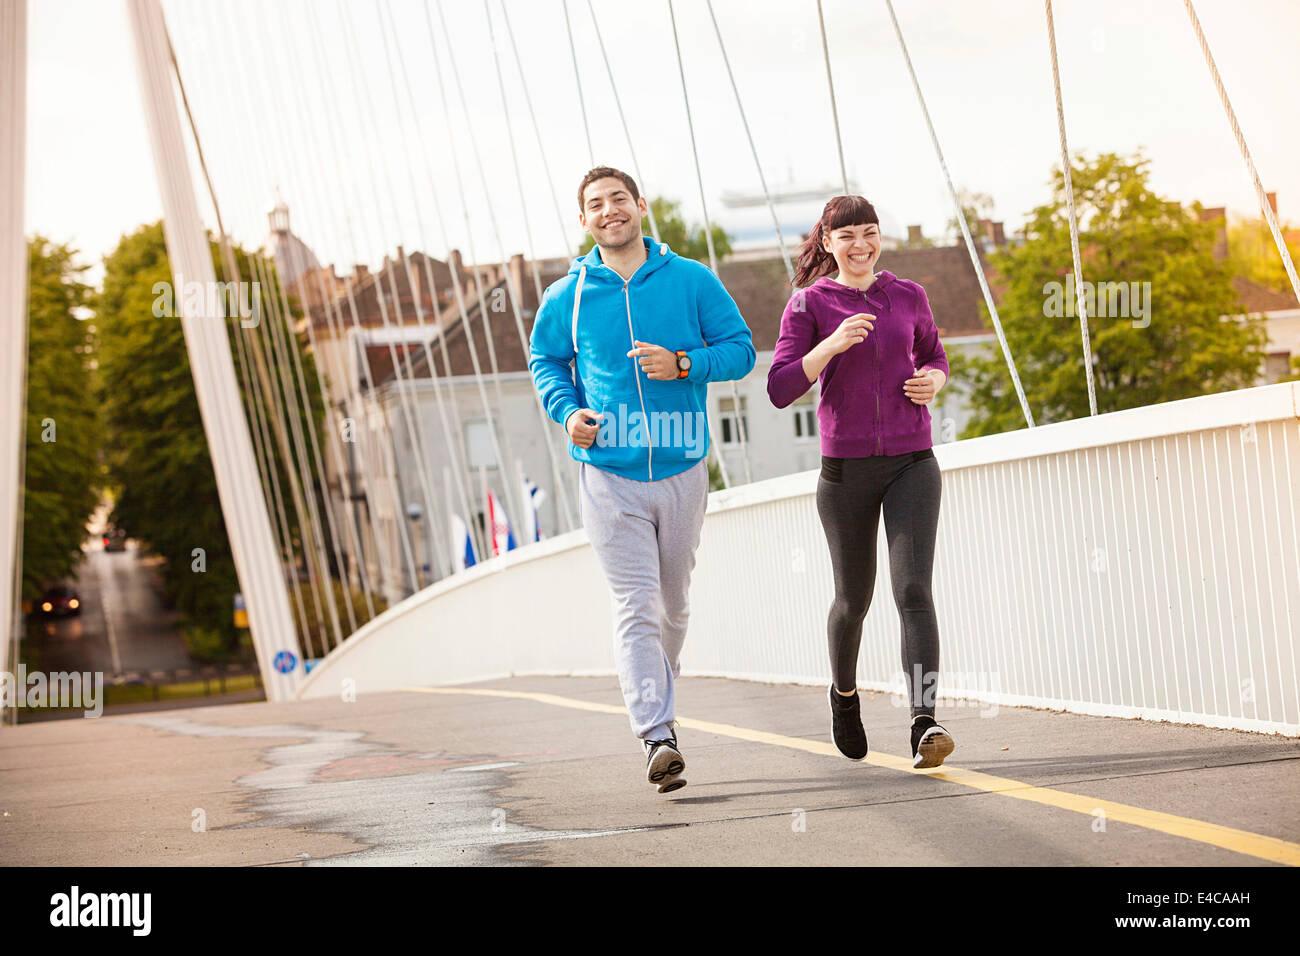 Pareja joven trotar en el puente, en Osijek, Croacia Imagen De Stock